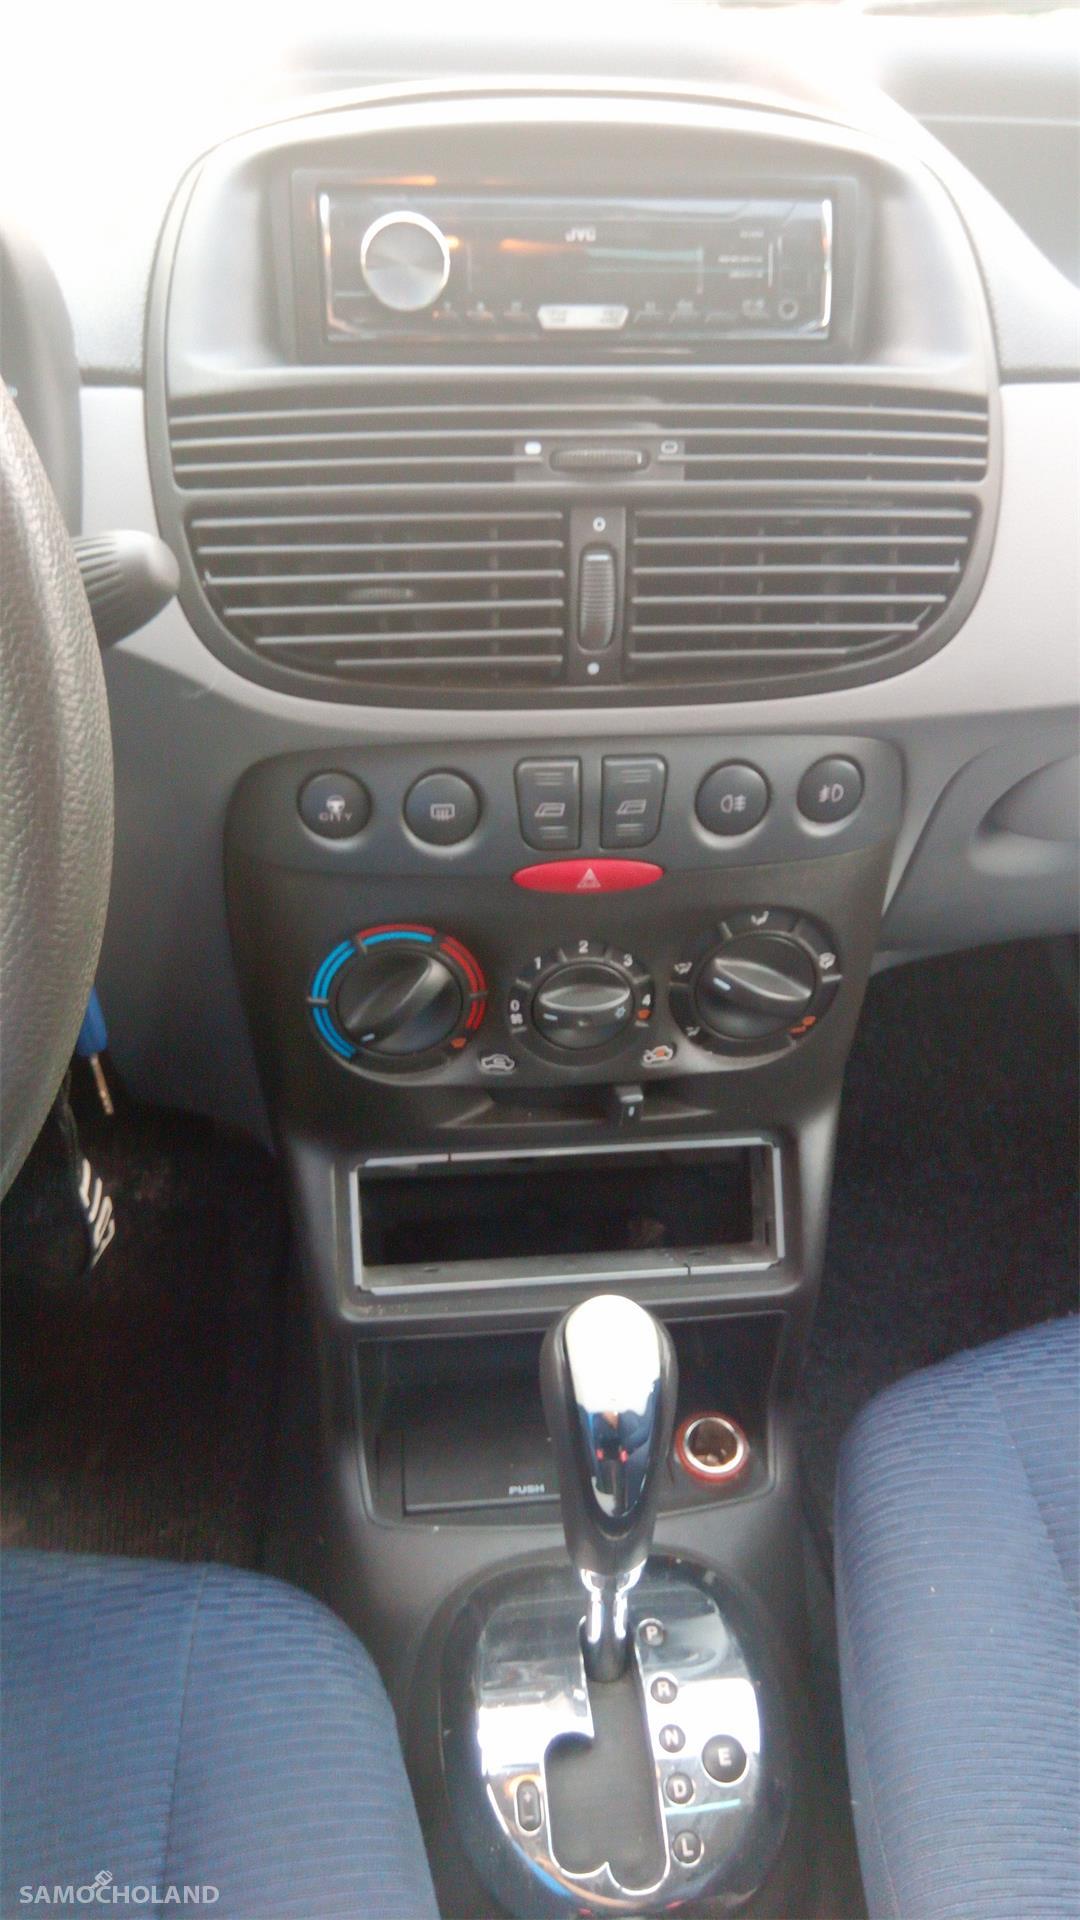 Fiat Punto II (1999-2003) Fiat Punto 1,2 automat, klimatyzacja 29